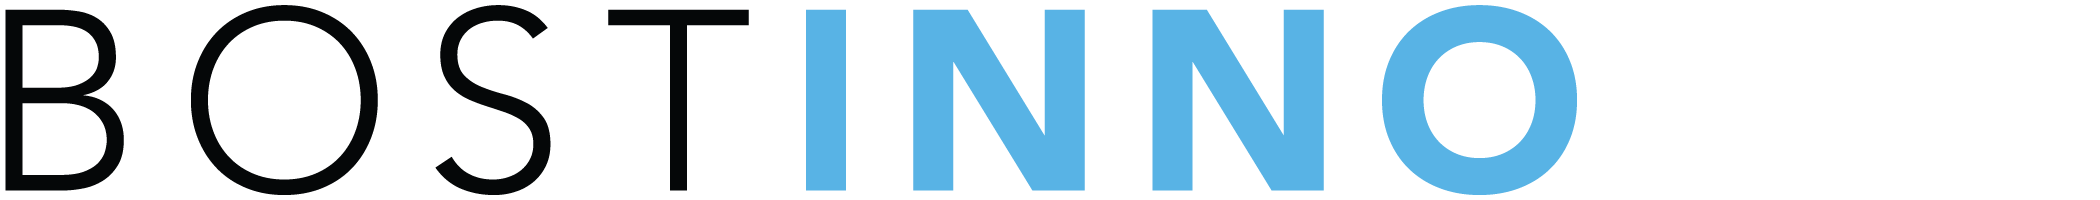 BostInno_Logo (1).png